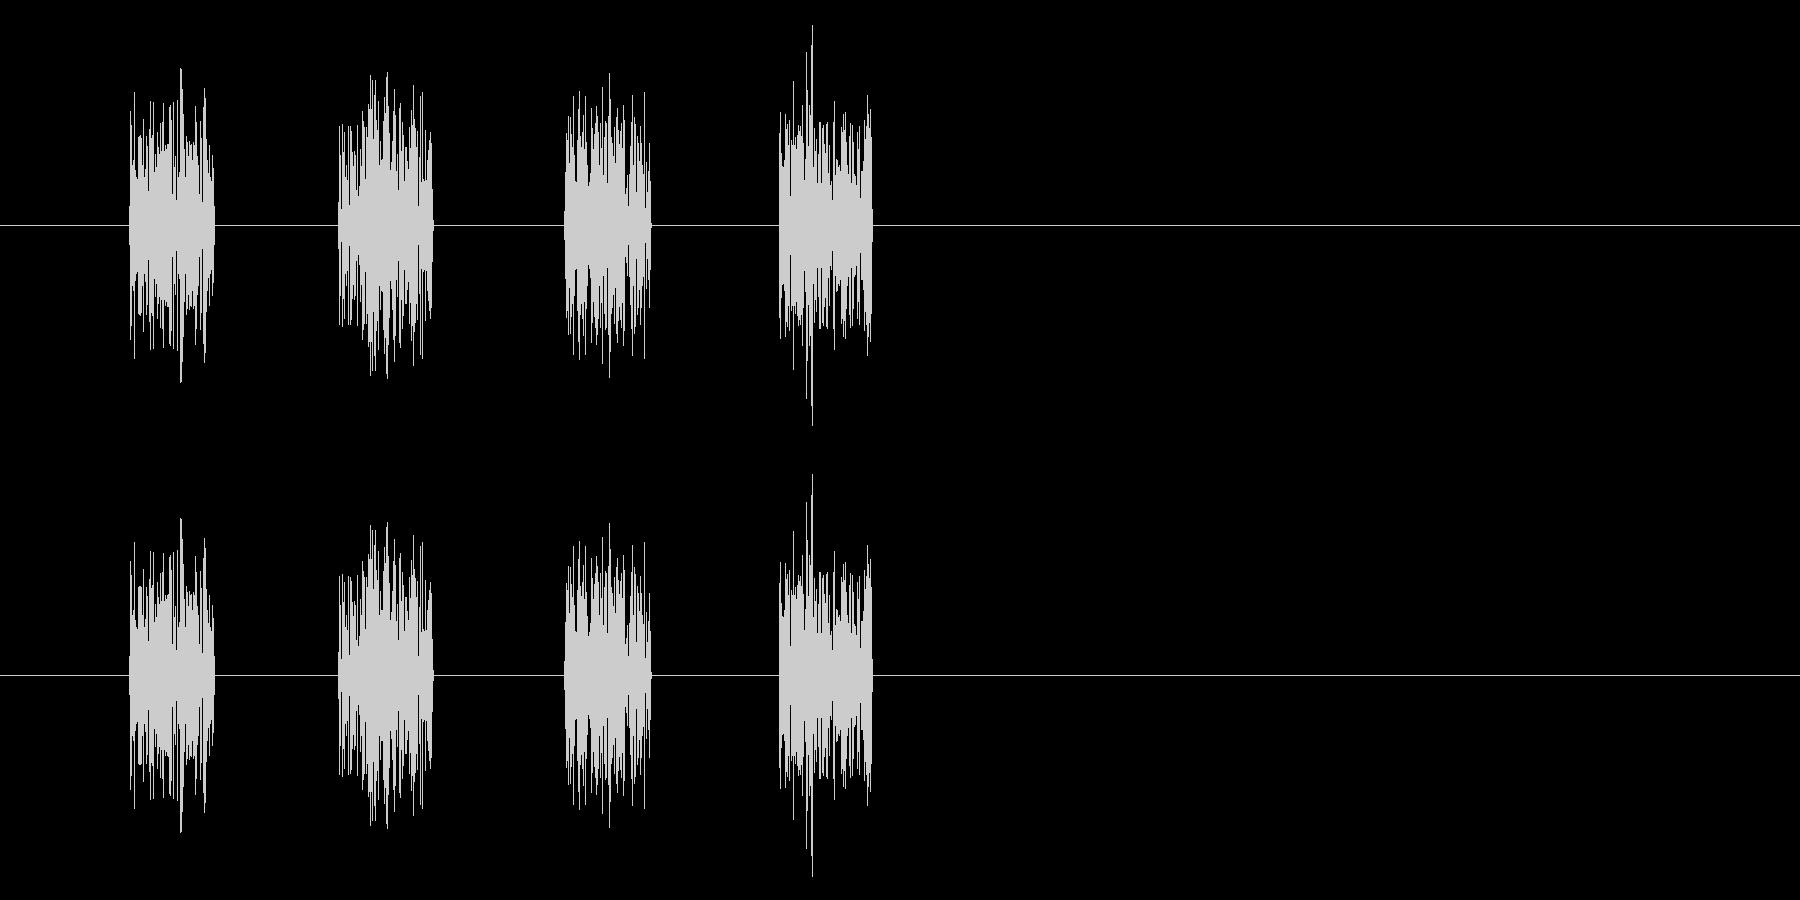 【NES RPG02-01(入る)】の未再生の波形